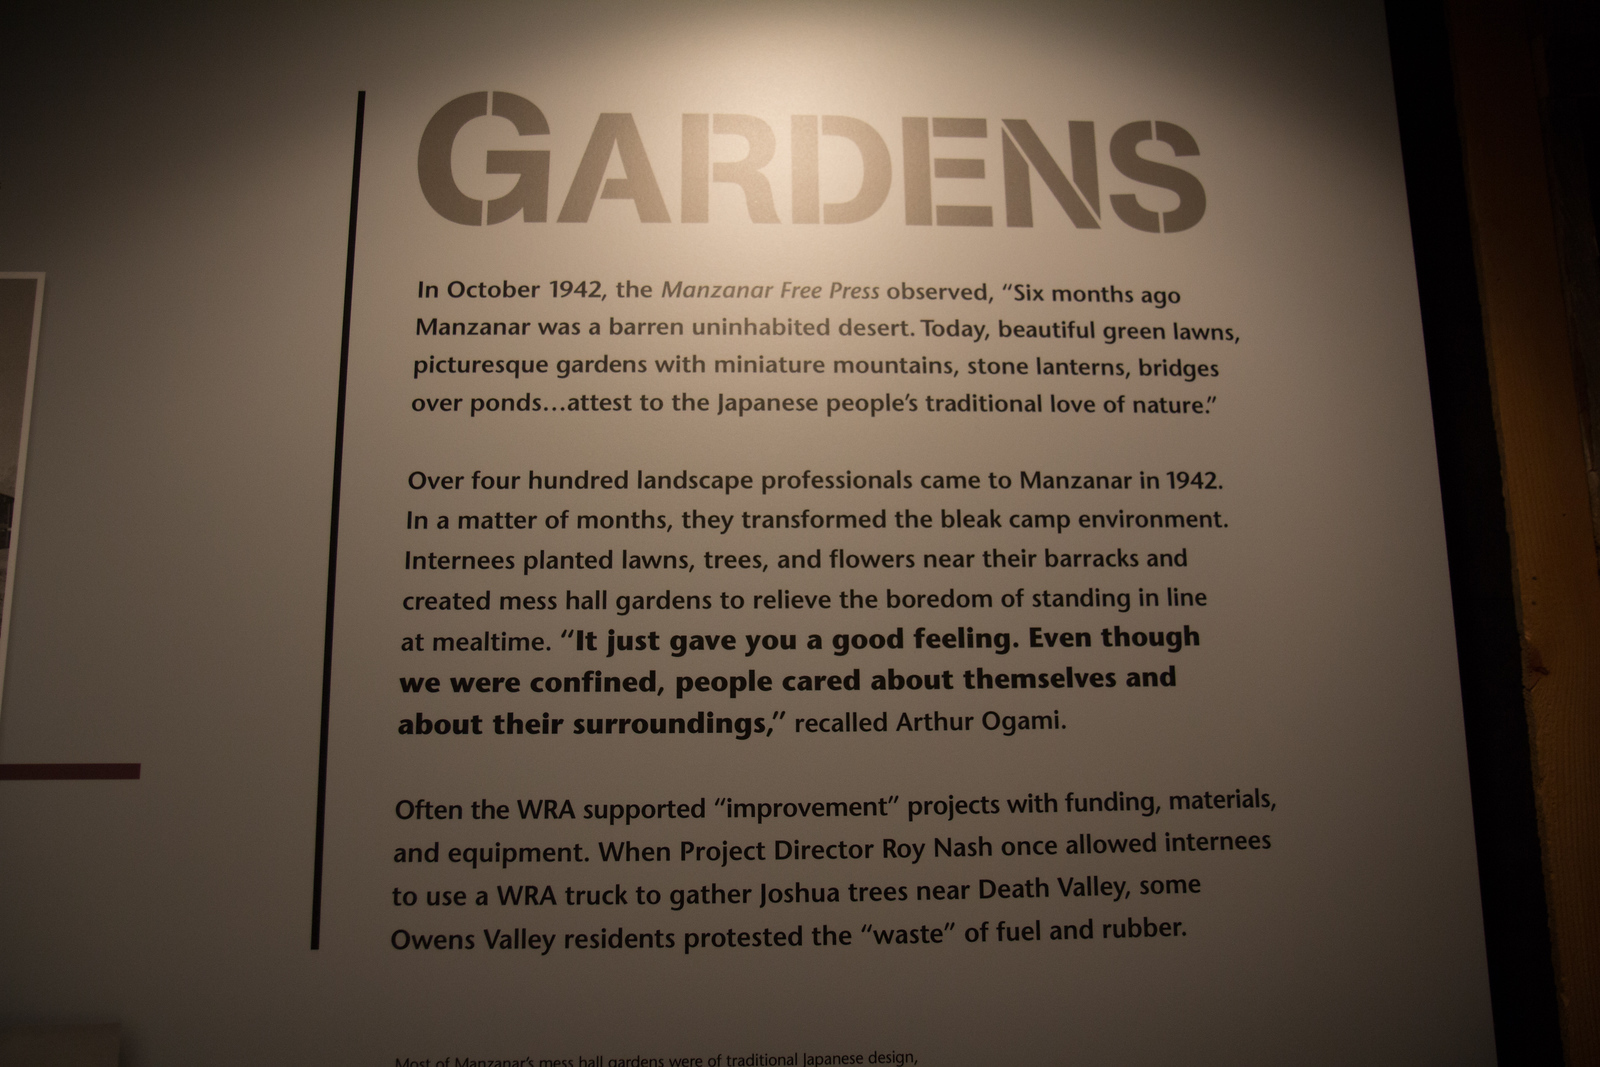 Manzanar garden